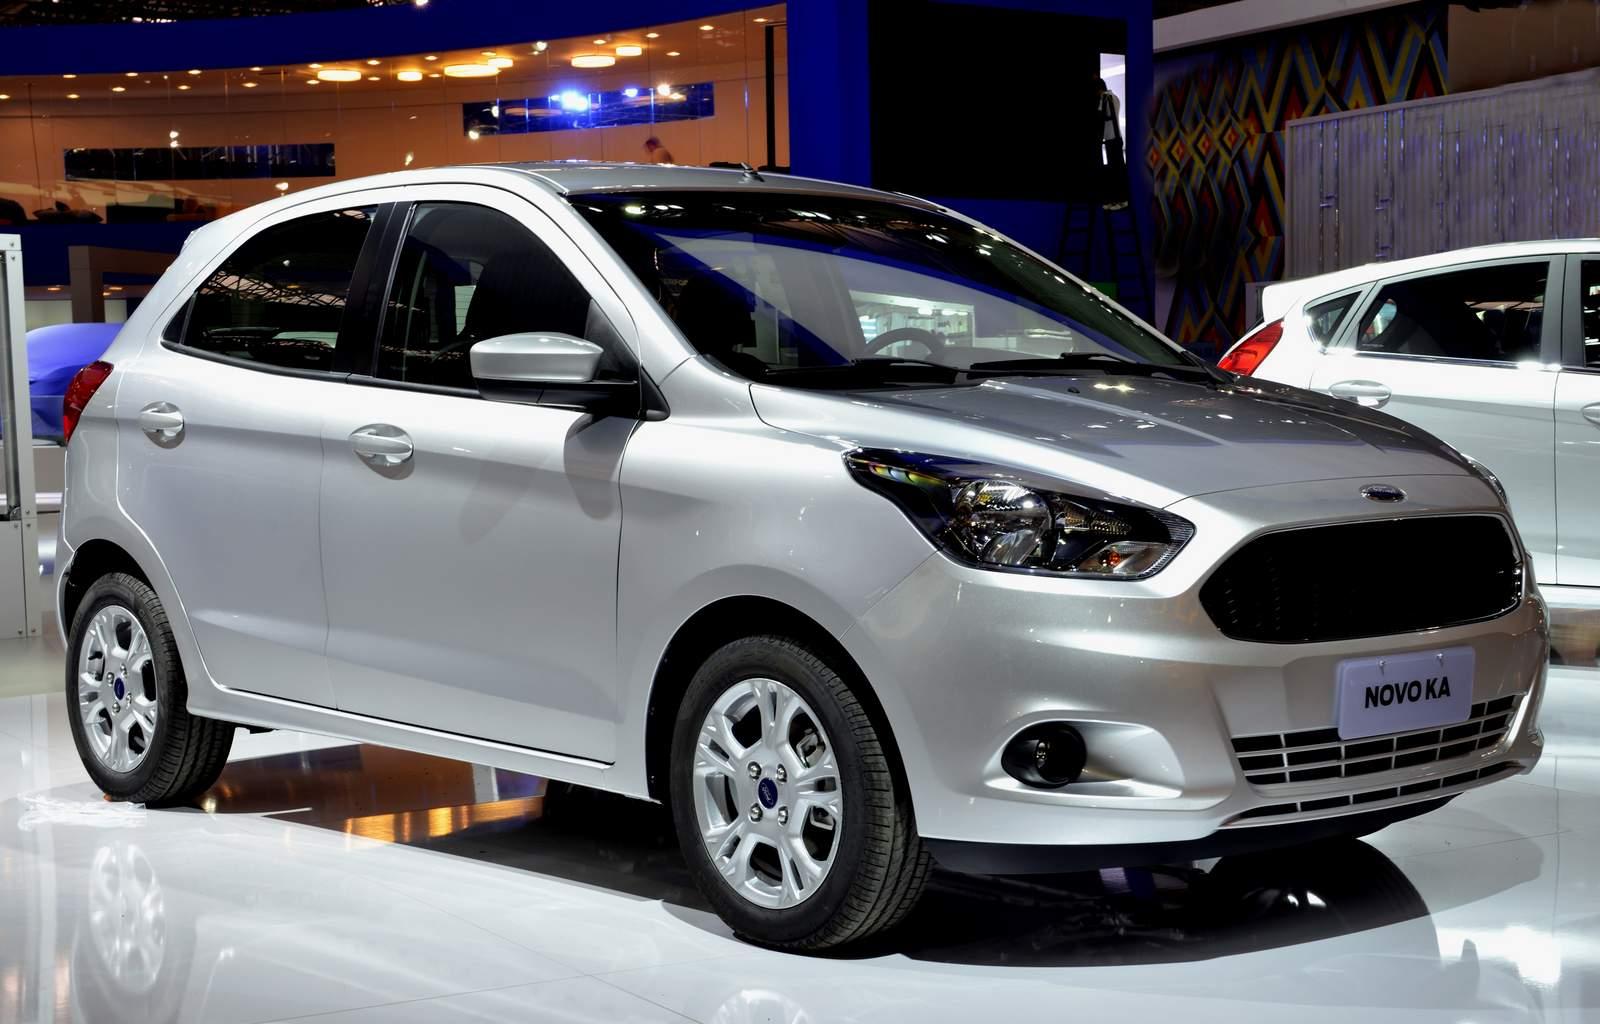 Novos ford ka e ka s o destaque da marca no sal o de sp